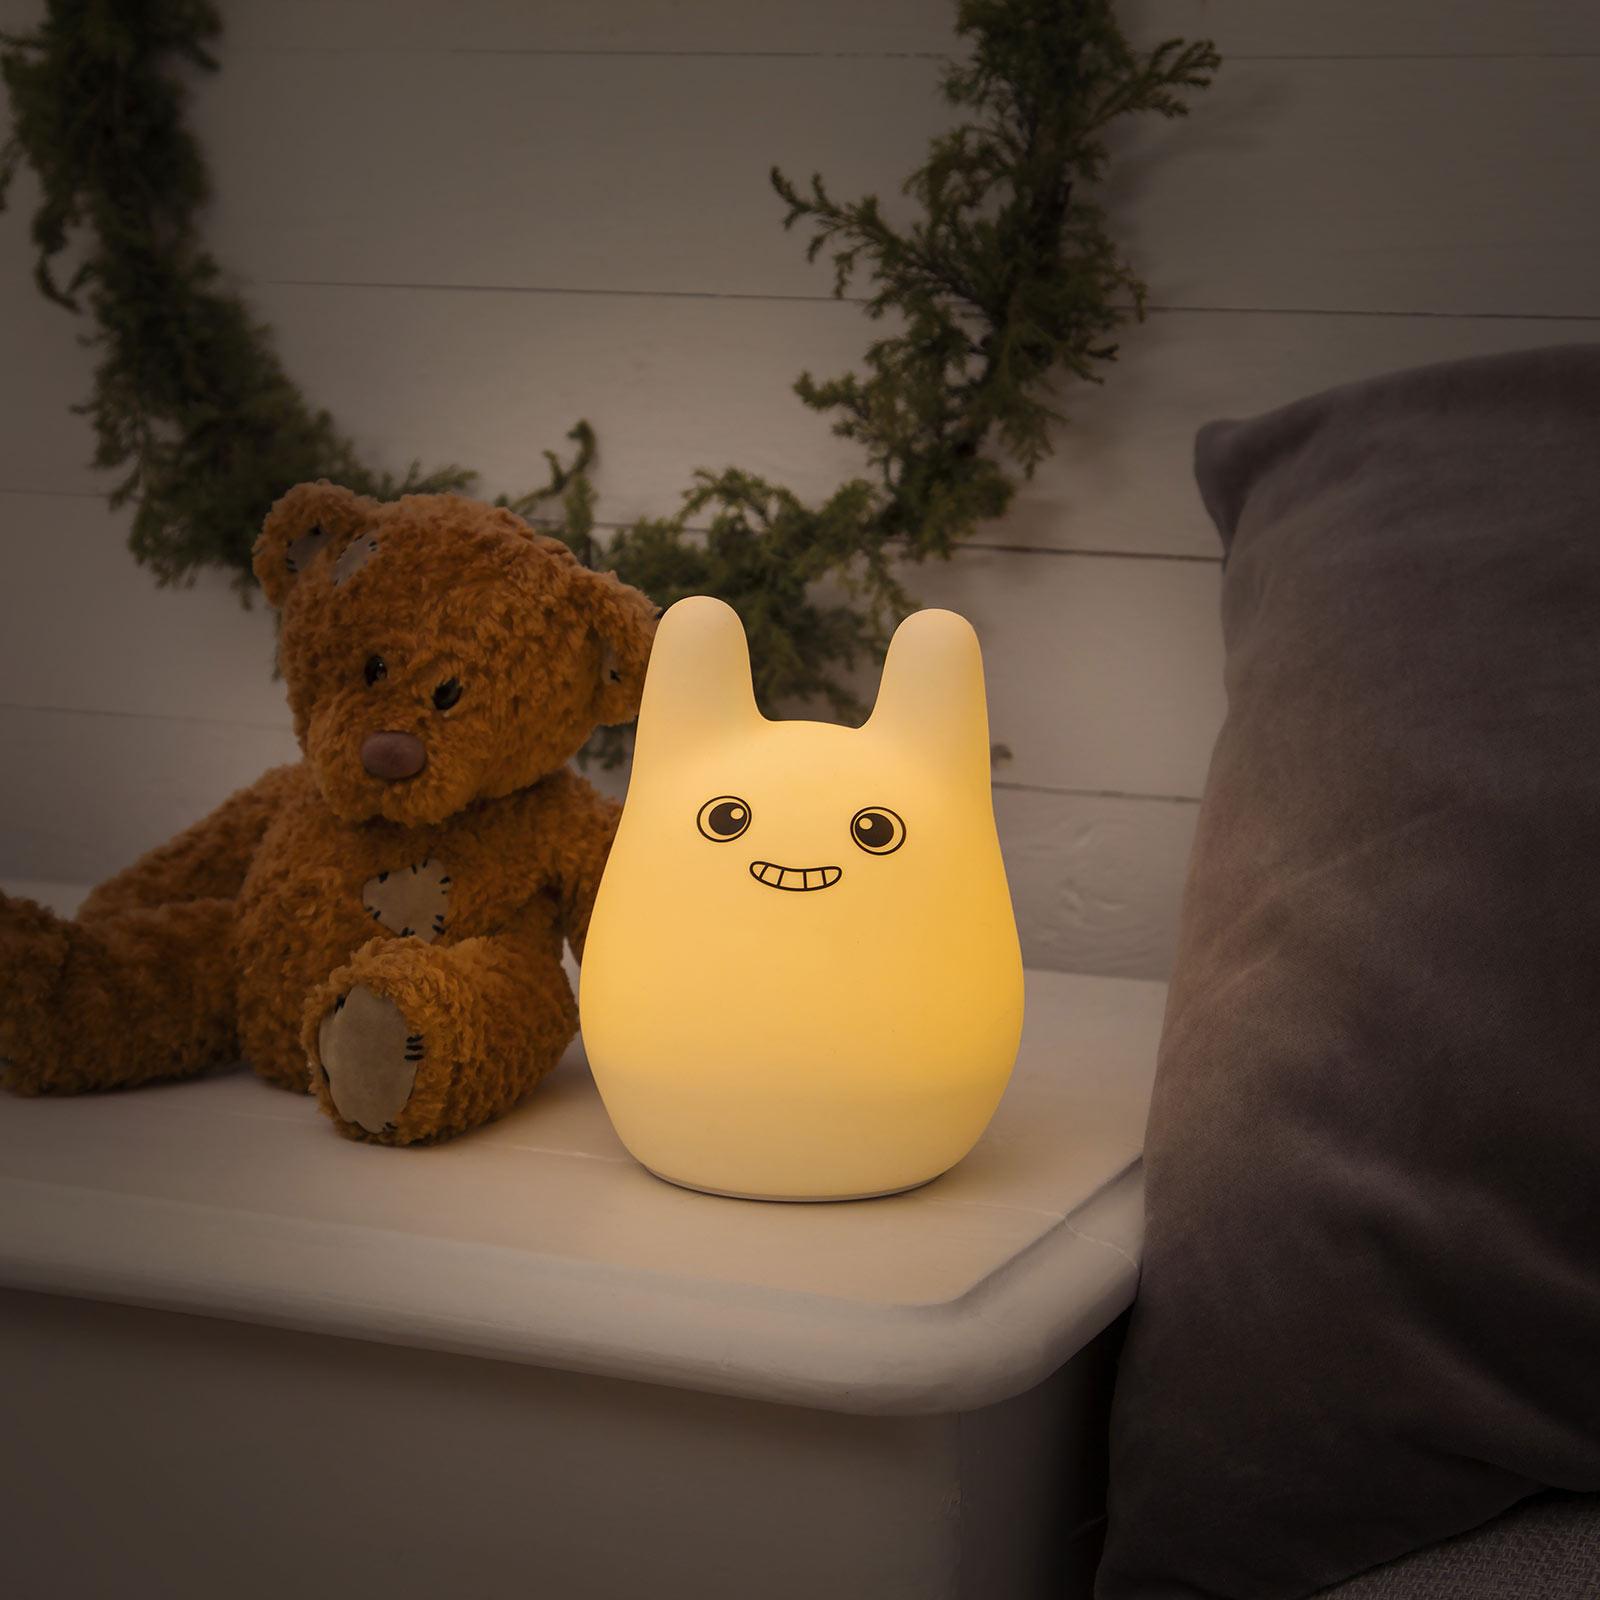 LED-Nachtlicht 357-60, RGBW, USB-charge